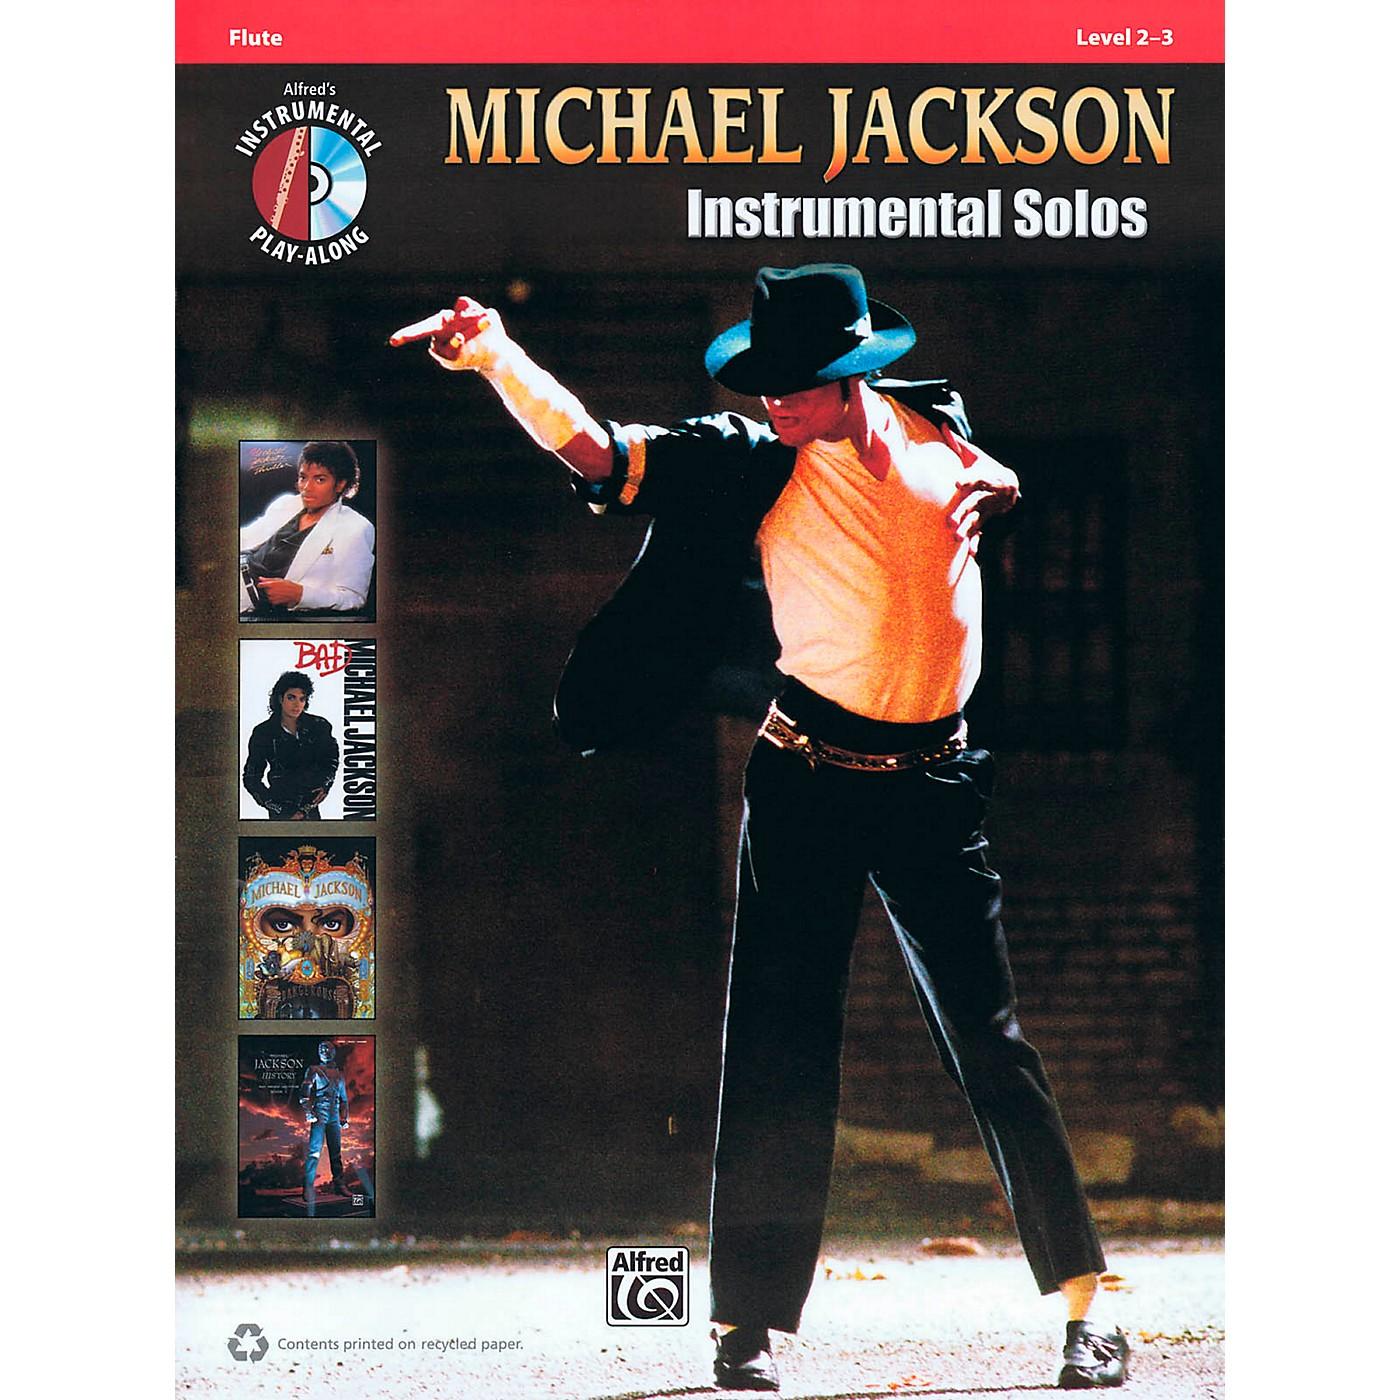 Hal Leonard Michael Jackson - Instrumental Solos Play-Along for Flute Book/CD thumbnail